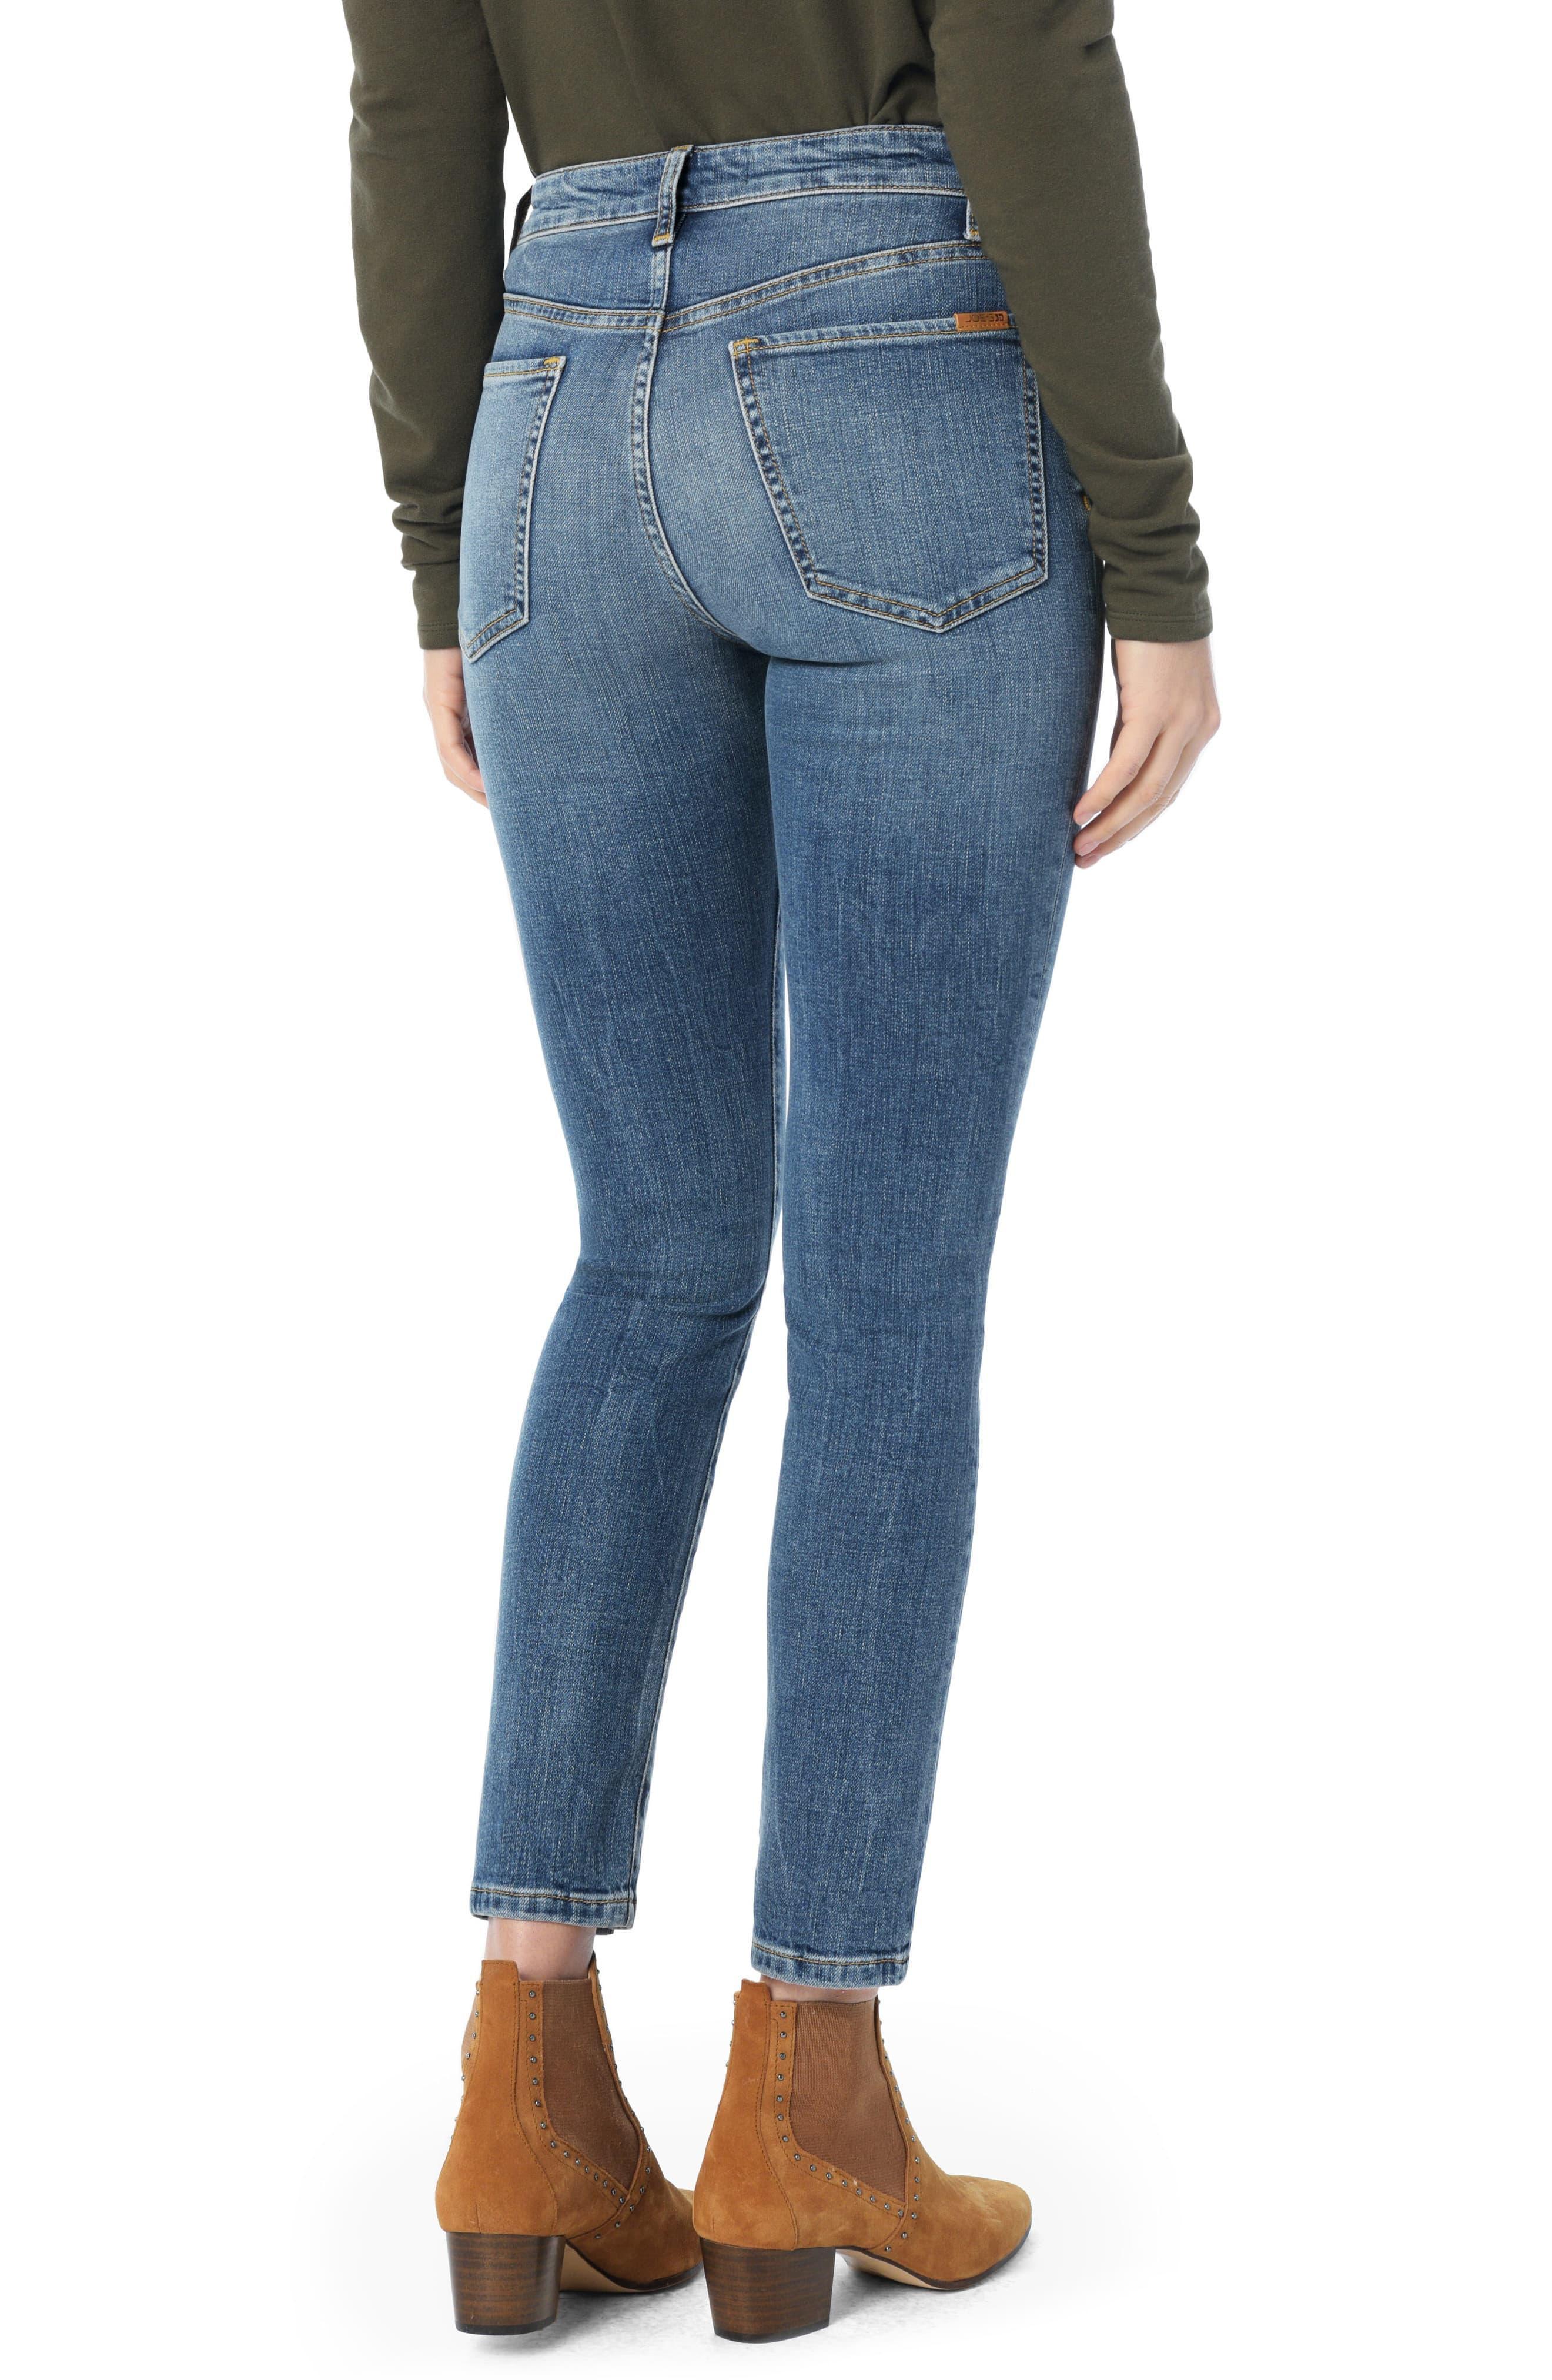 69f24eb32756c2 Joe's Charlie Pintuck High Waist Ankle Skinny Jeans in Blue - Lyst